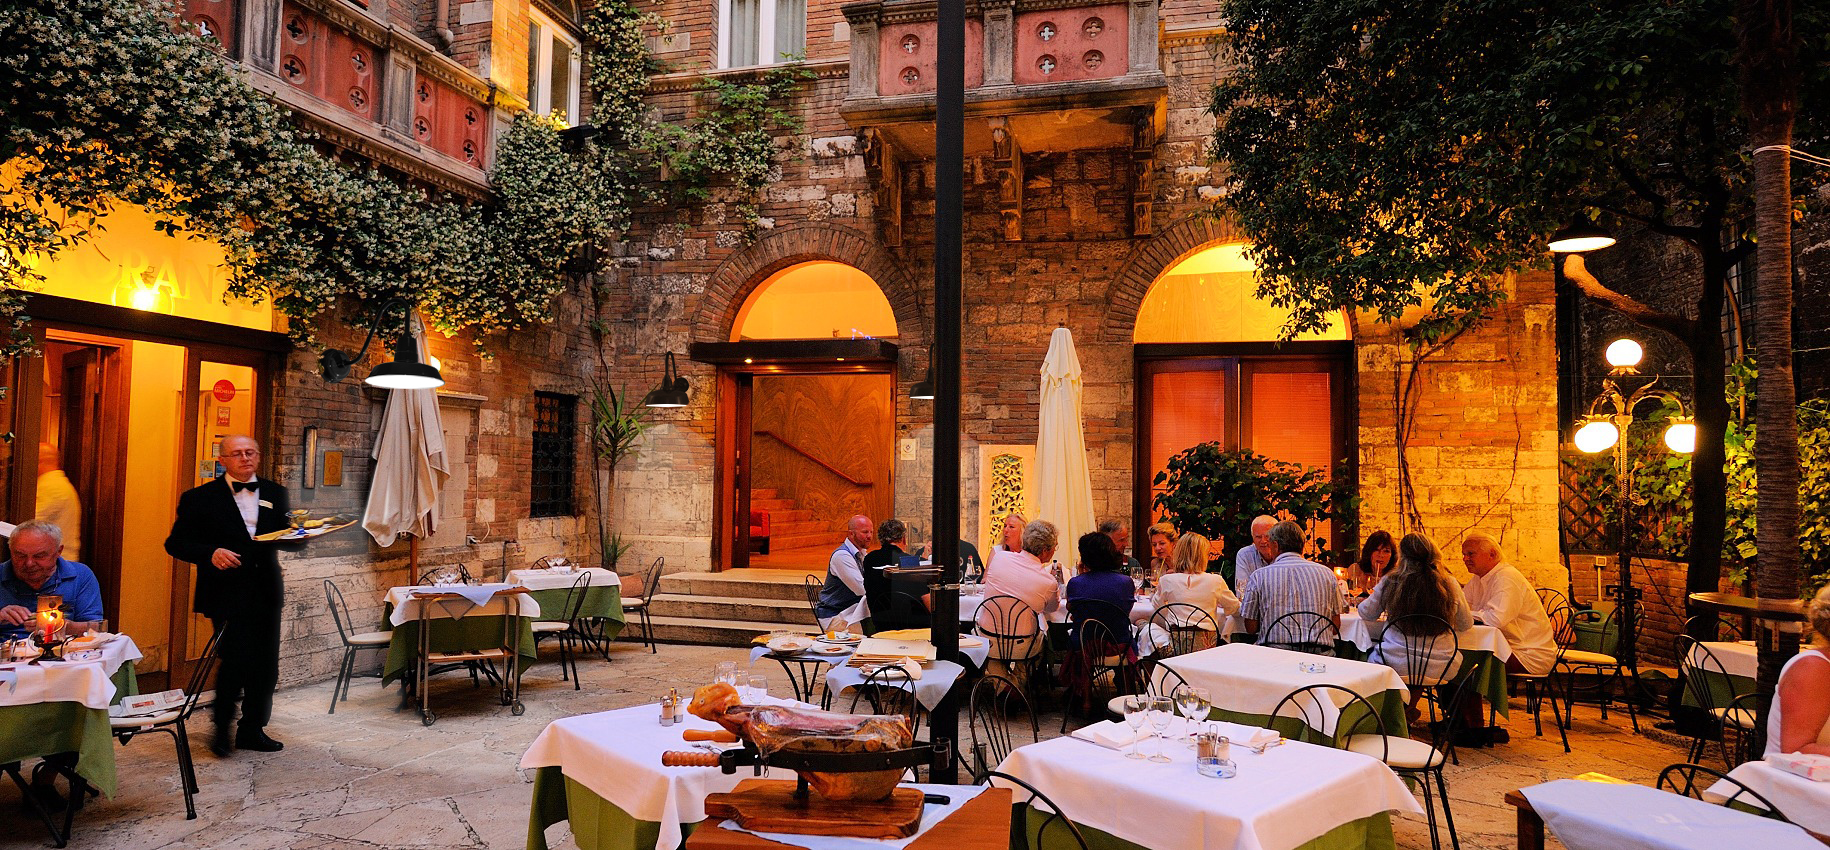 Restaurant lighting ideas for your business cocoweb restaurant lighting aloadofball Images